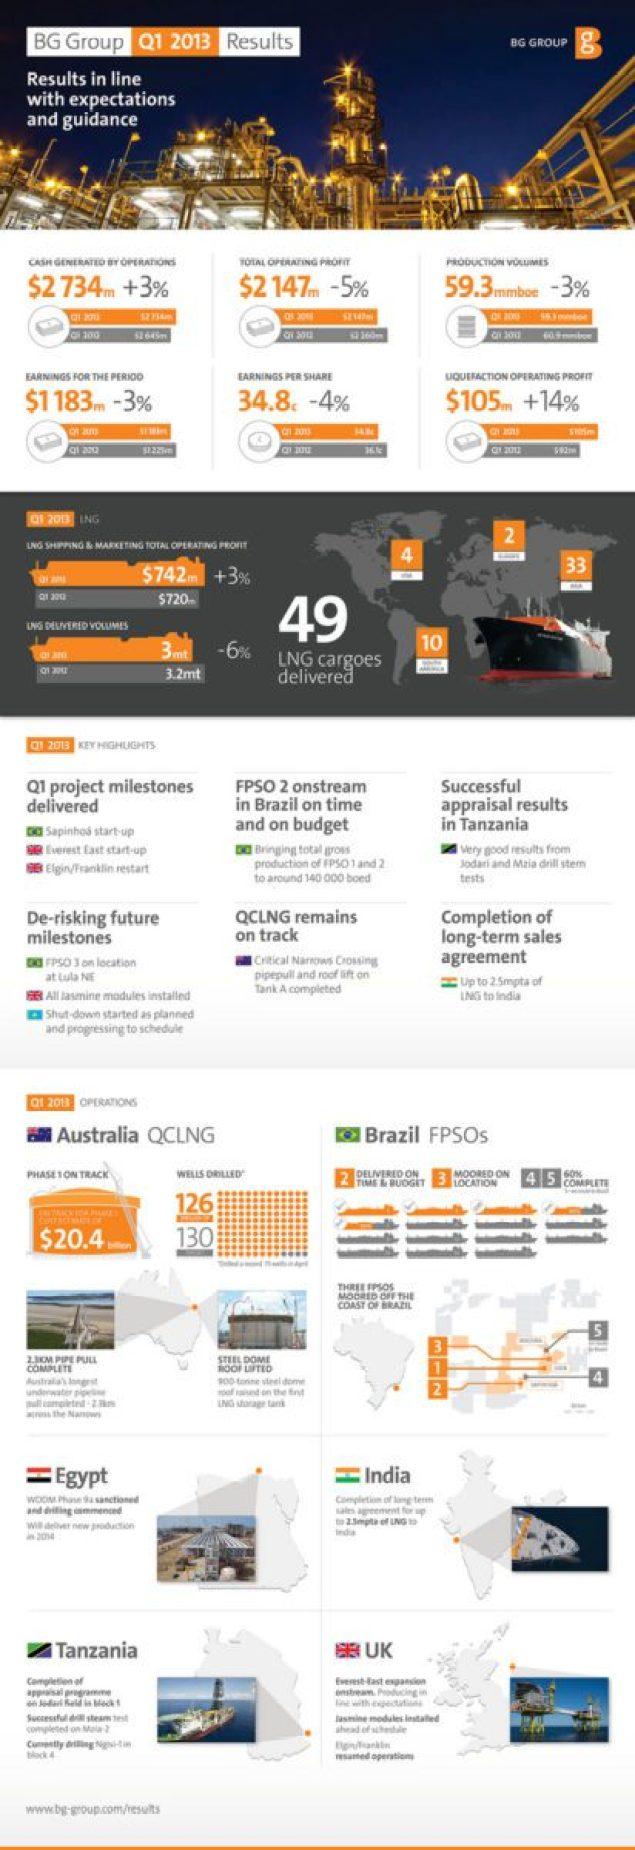 BG Group q1 2013 infographic